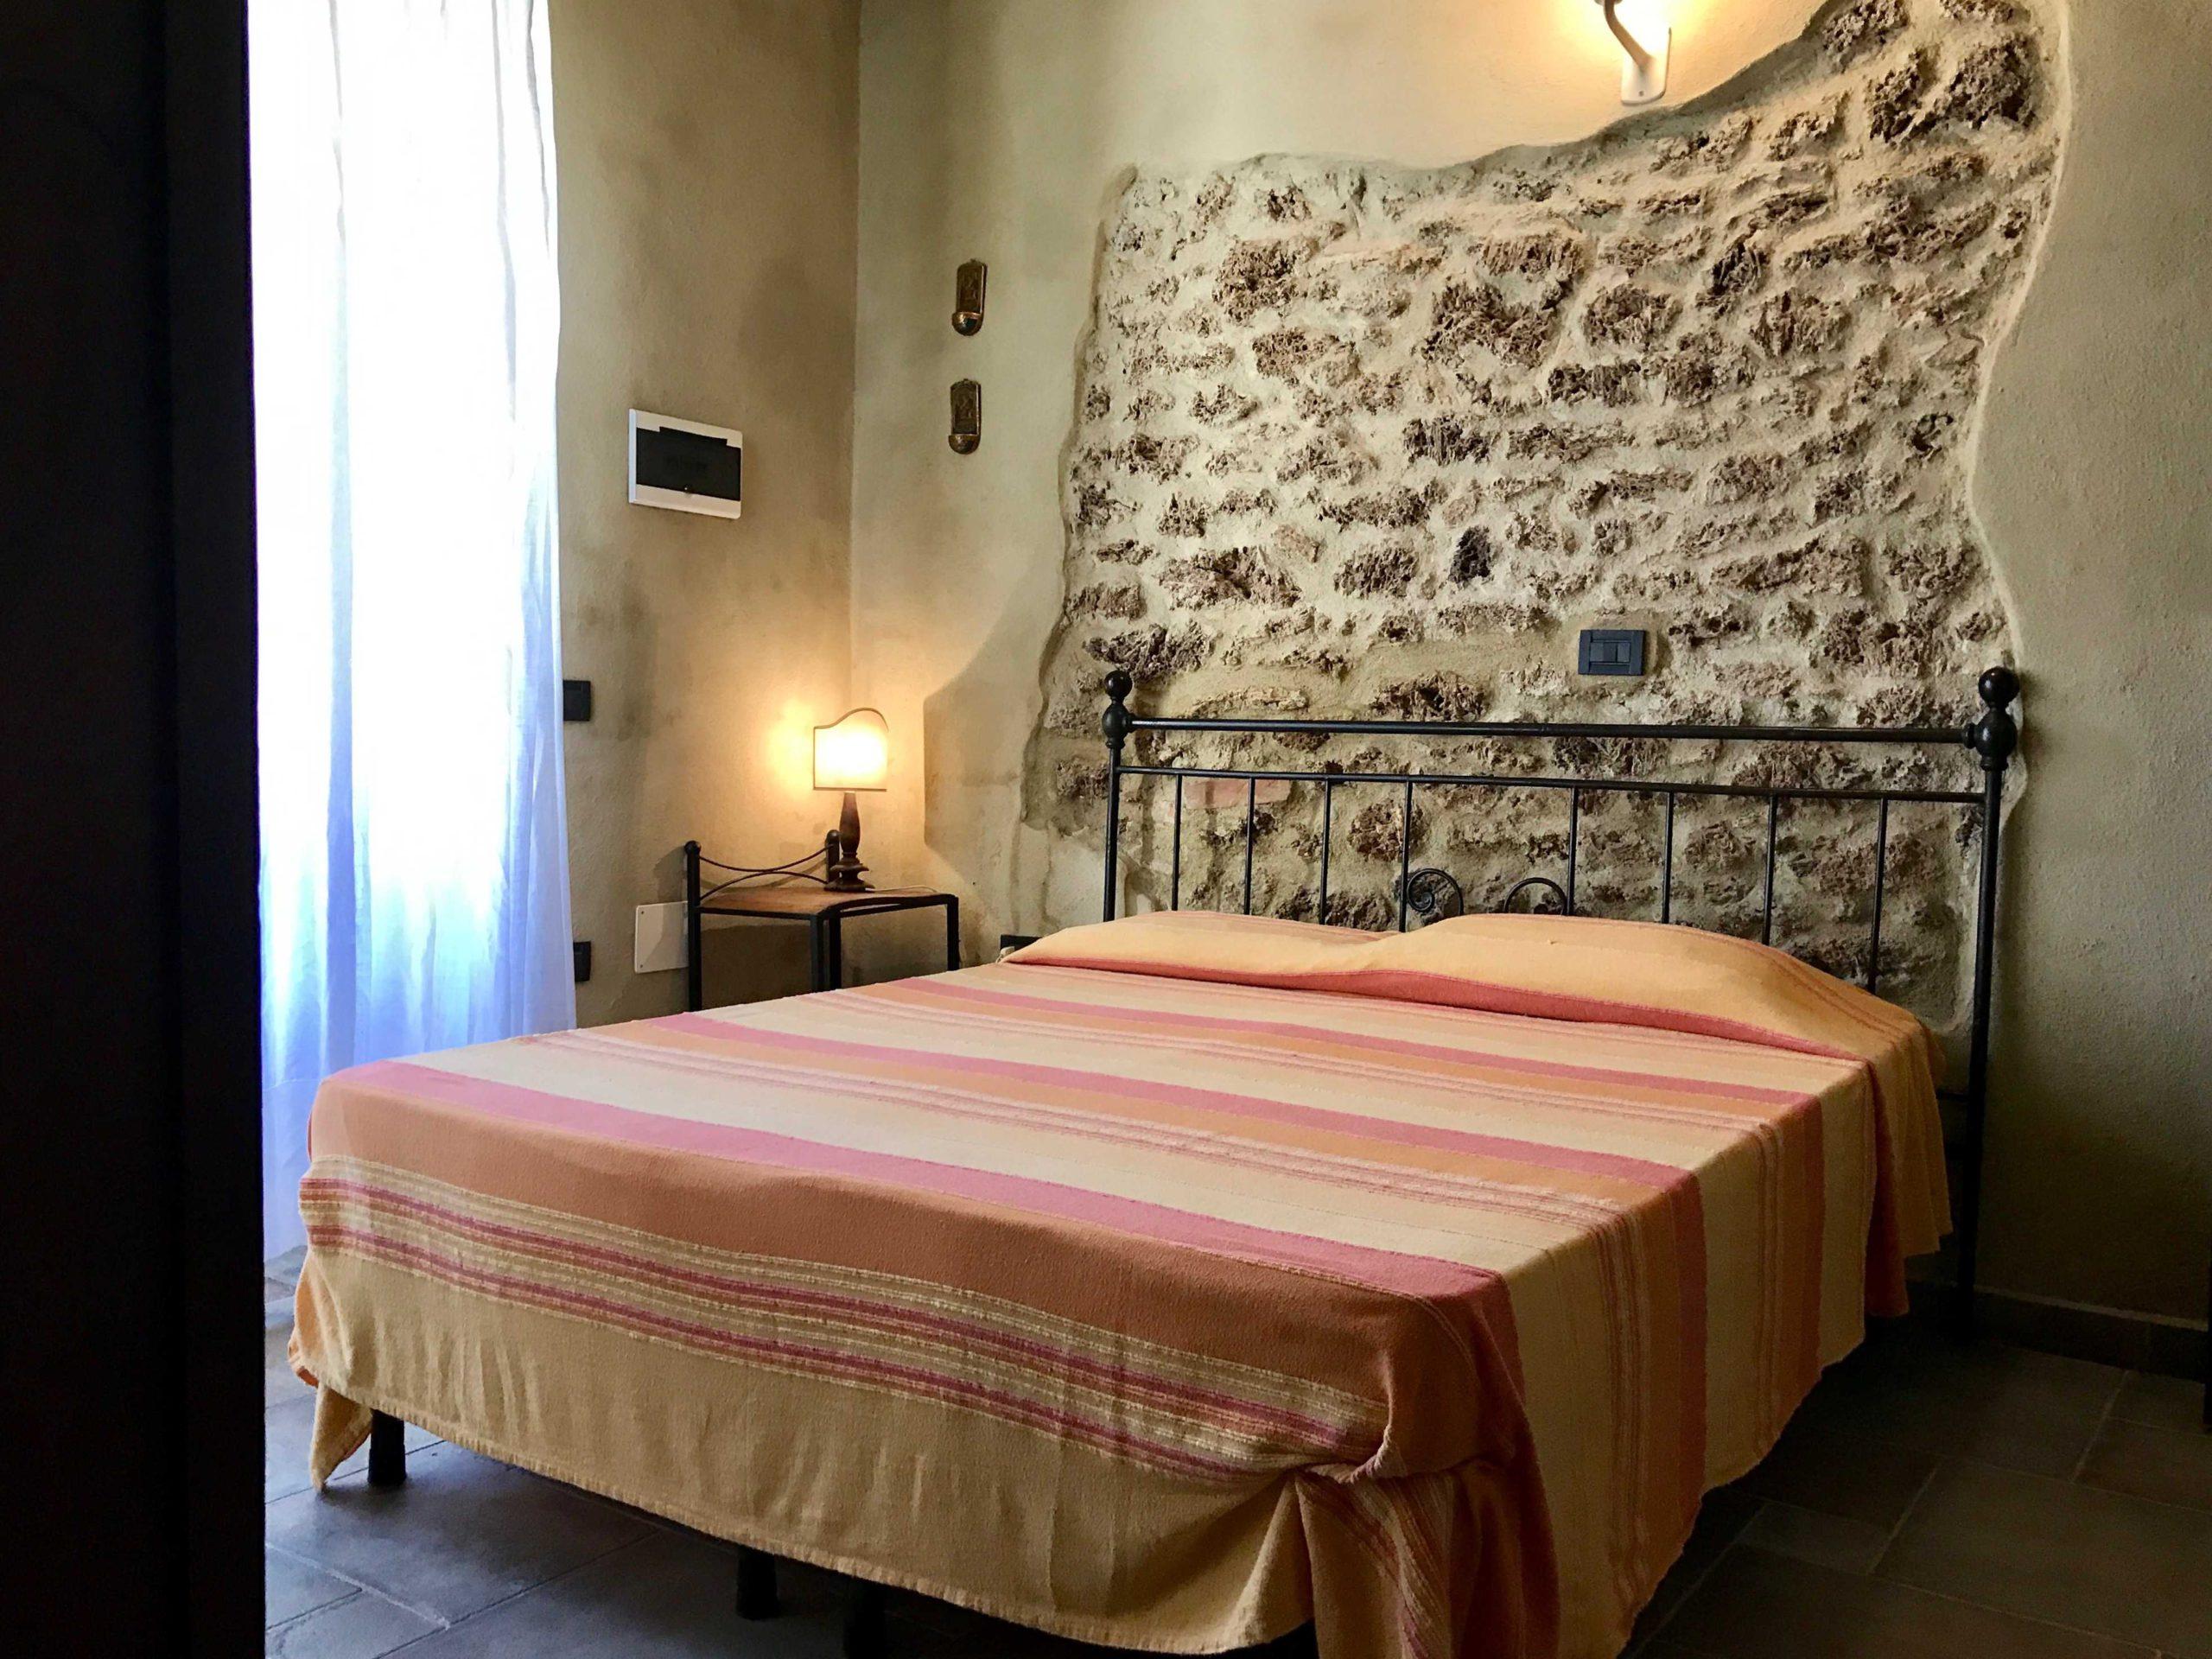 Ciliegi slaapkamer